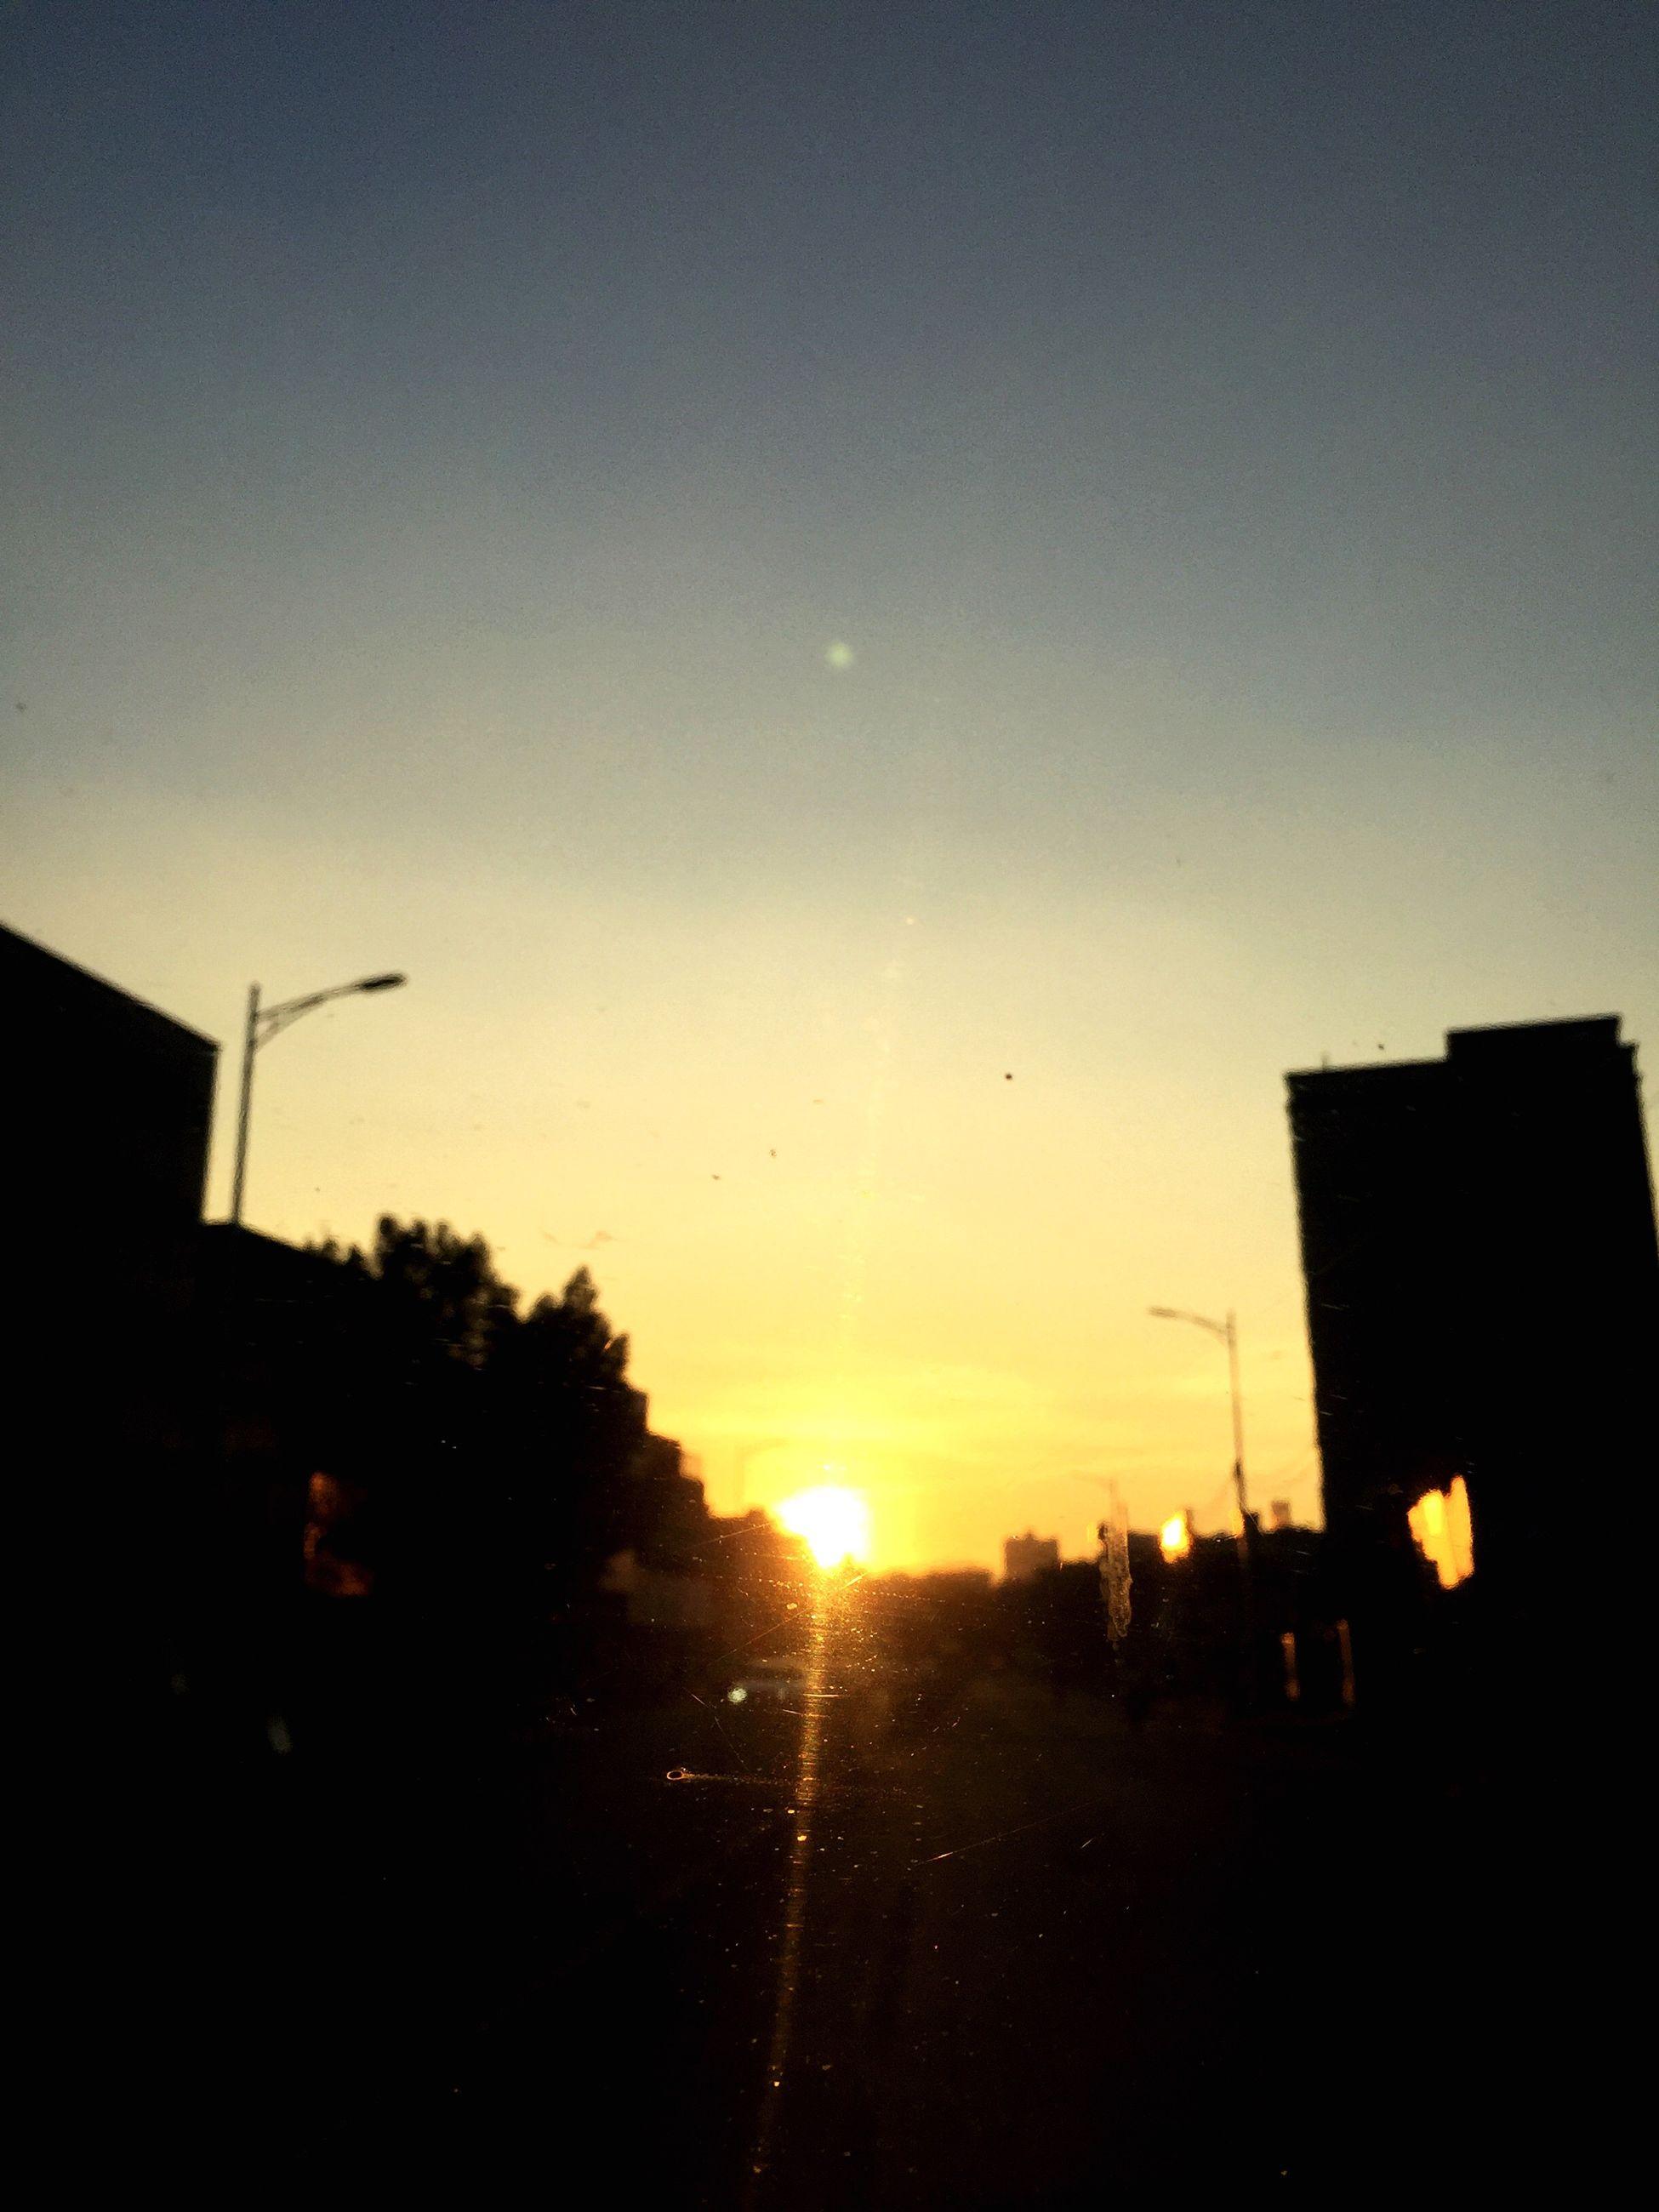 sunset, sun, silhouette, building exterior, built structure, architecture, clear sky, sunlight, copy space, orange color, sky, lens flare, tree, sunbeam, car, house, nature, outdoors, transportation, no people